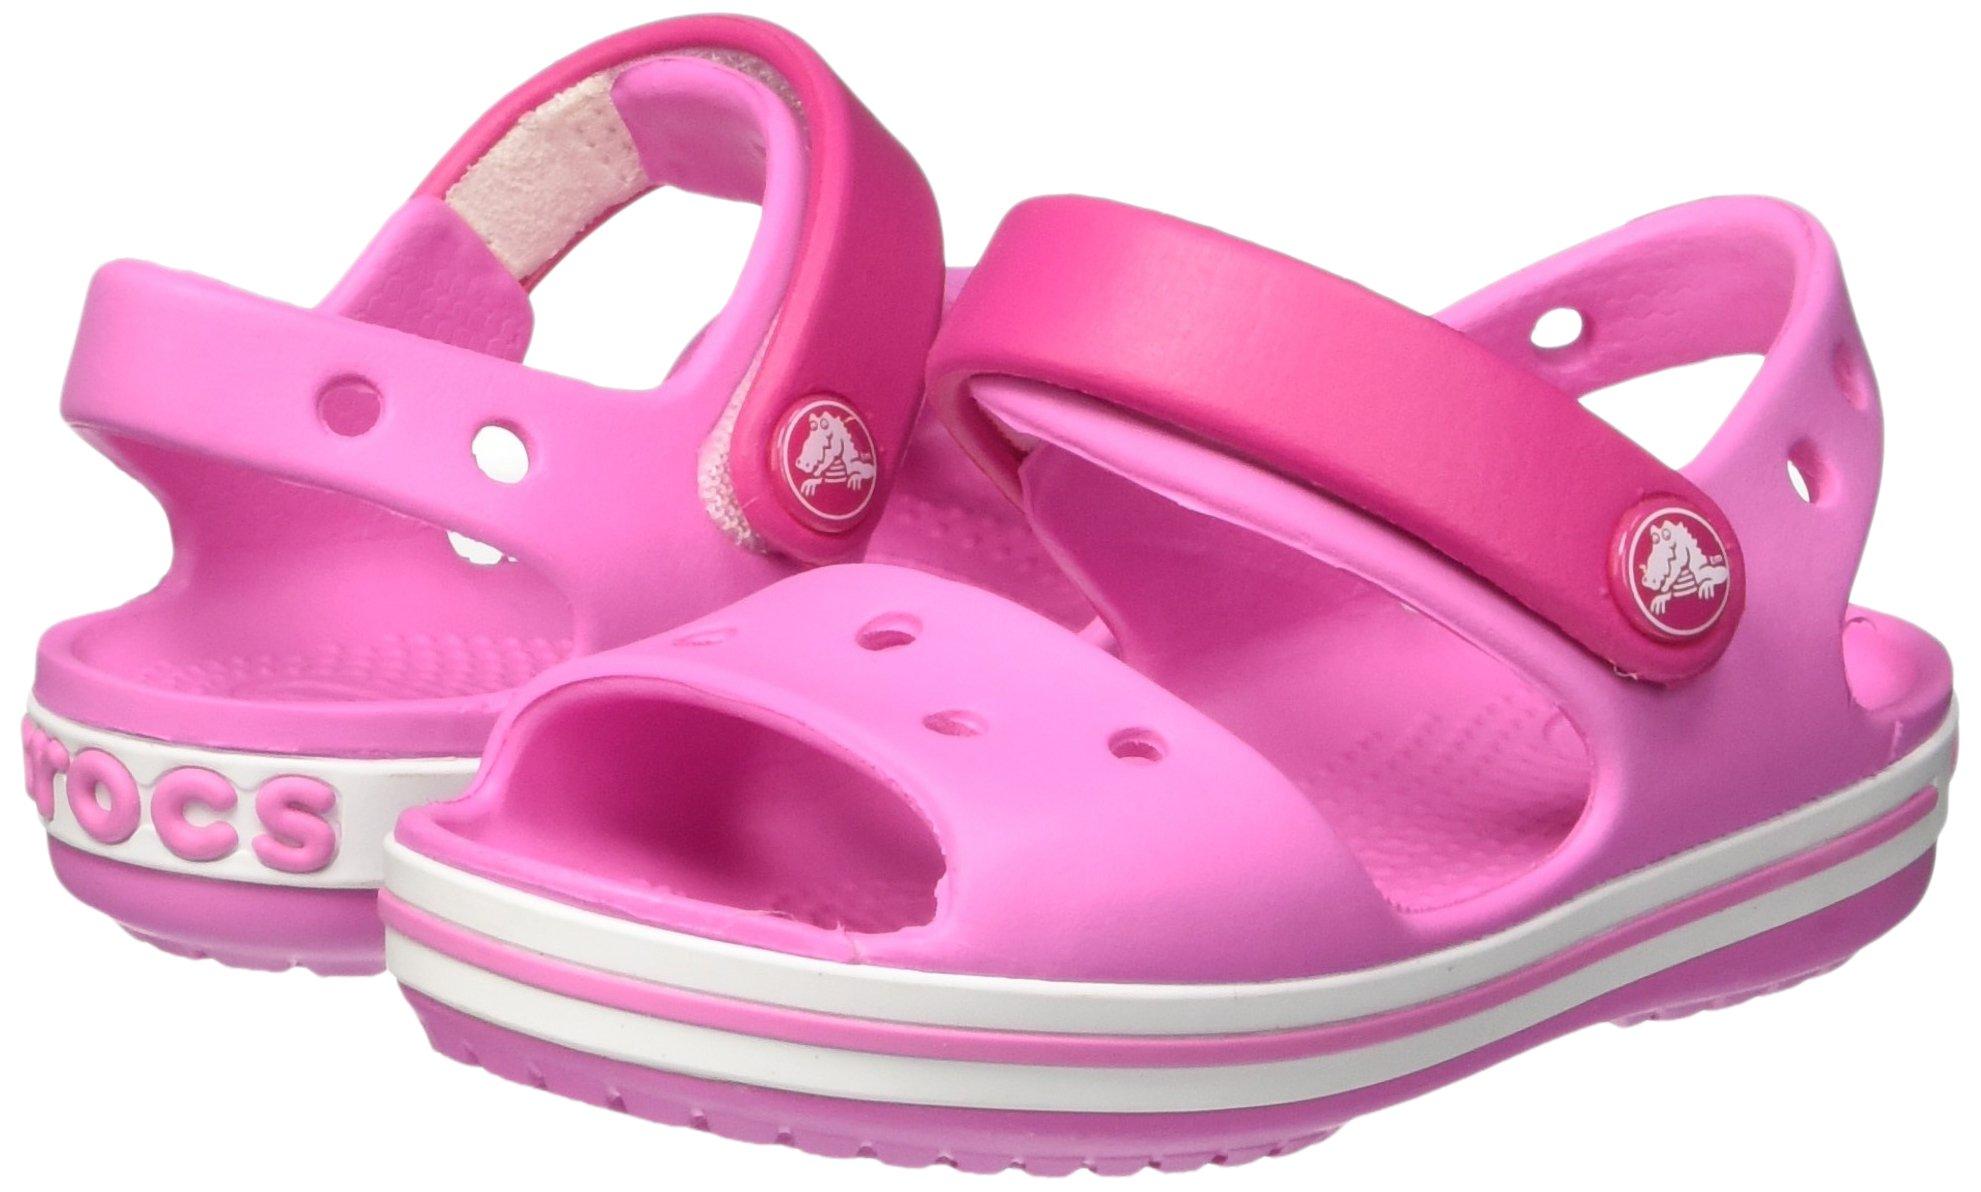 Crocs Crocband  Fun Lab   Light-Up Clog, Pink, C6 M US Toddler by Crocs (Image #5)